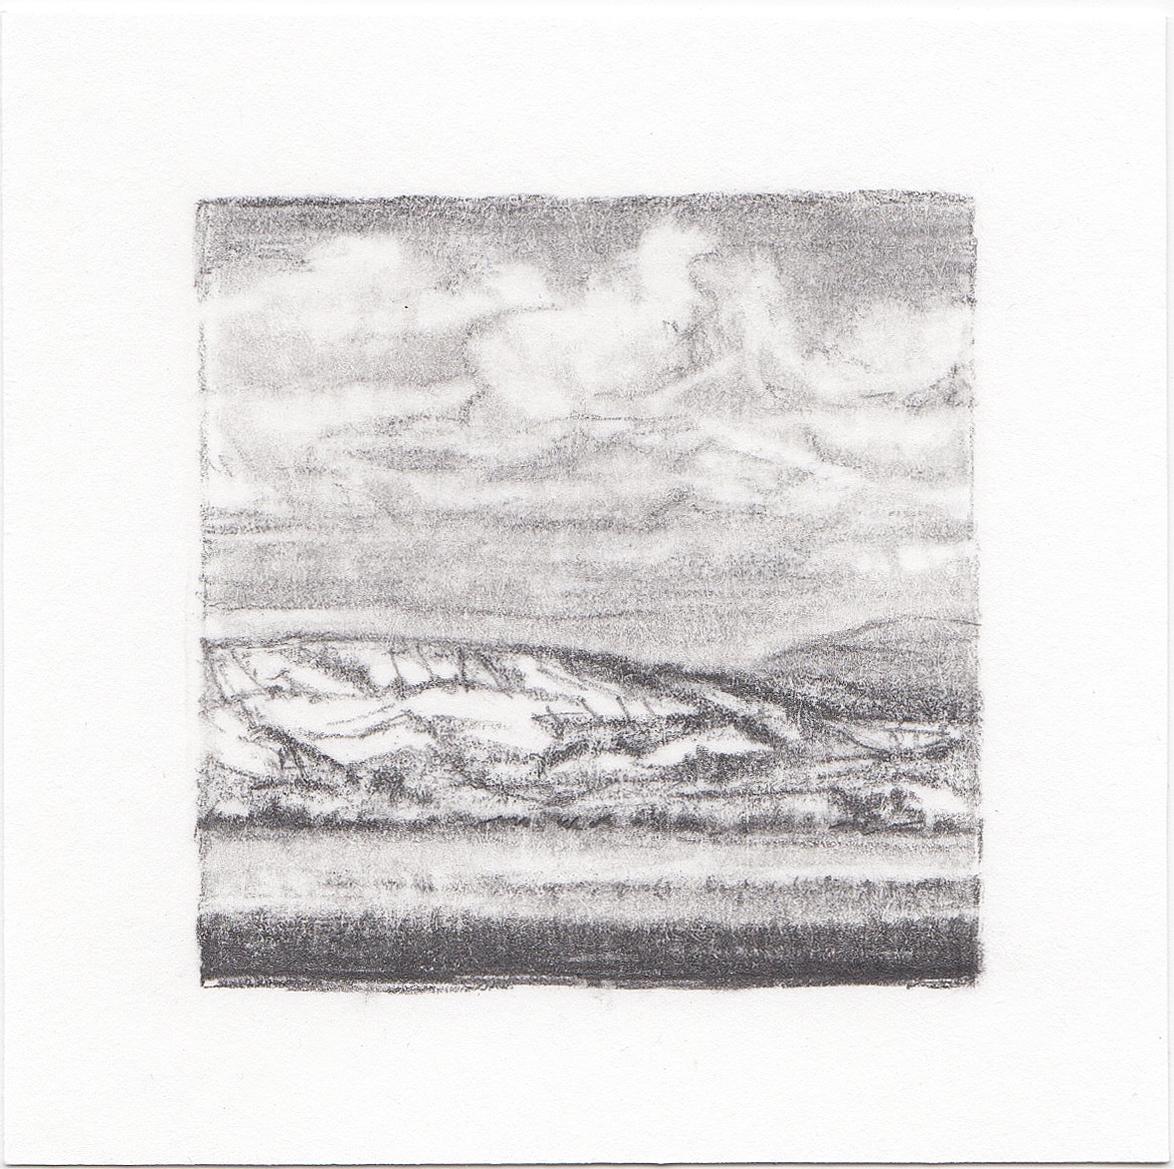 #25 Uinta Mountains, Utah | 3x3 | graphite